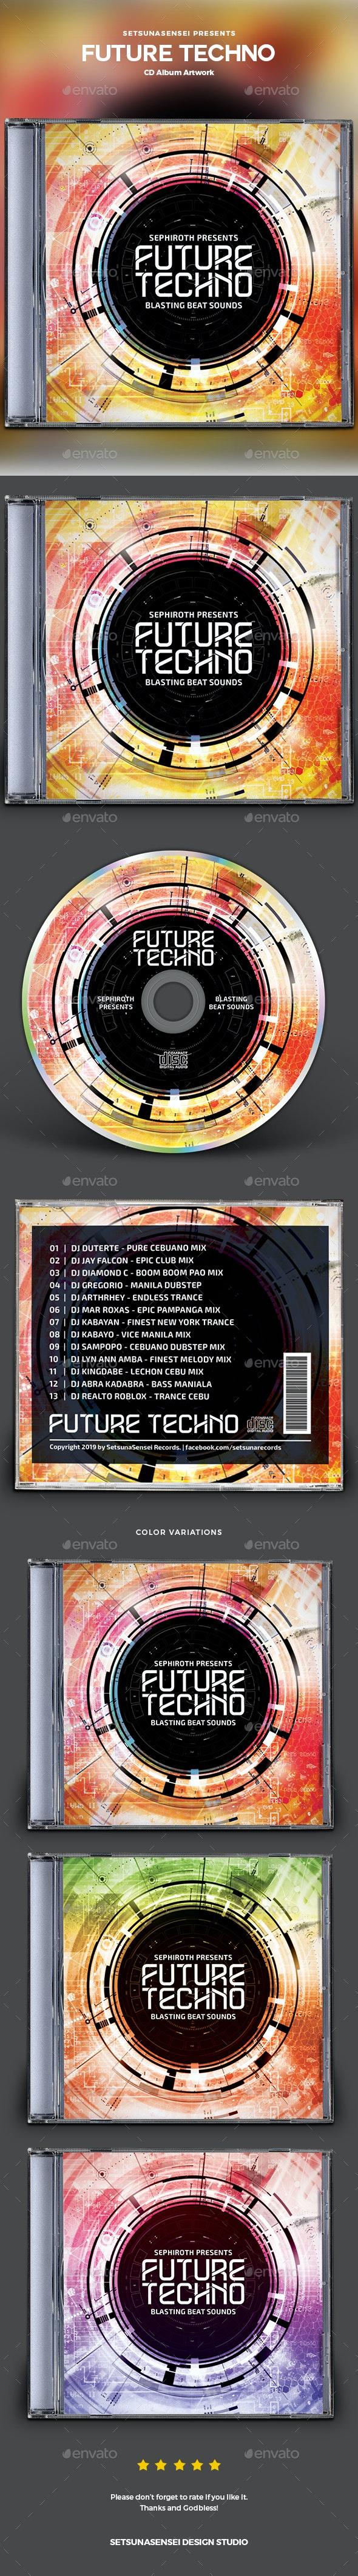 Future Techno CD Album Artwork - CD & DVD Artwork Print Templates